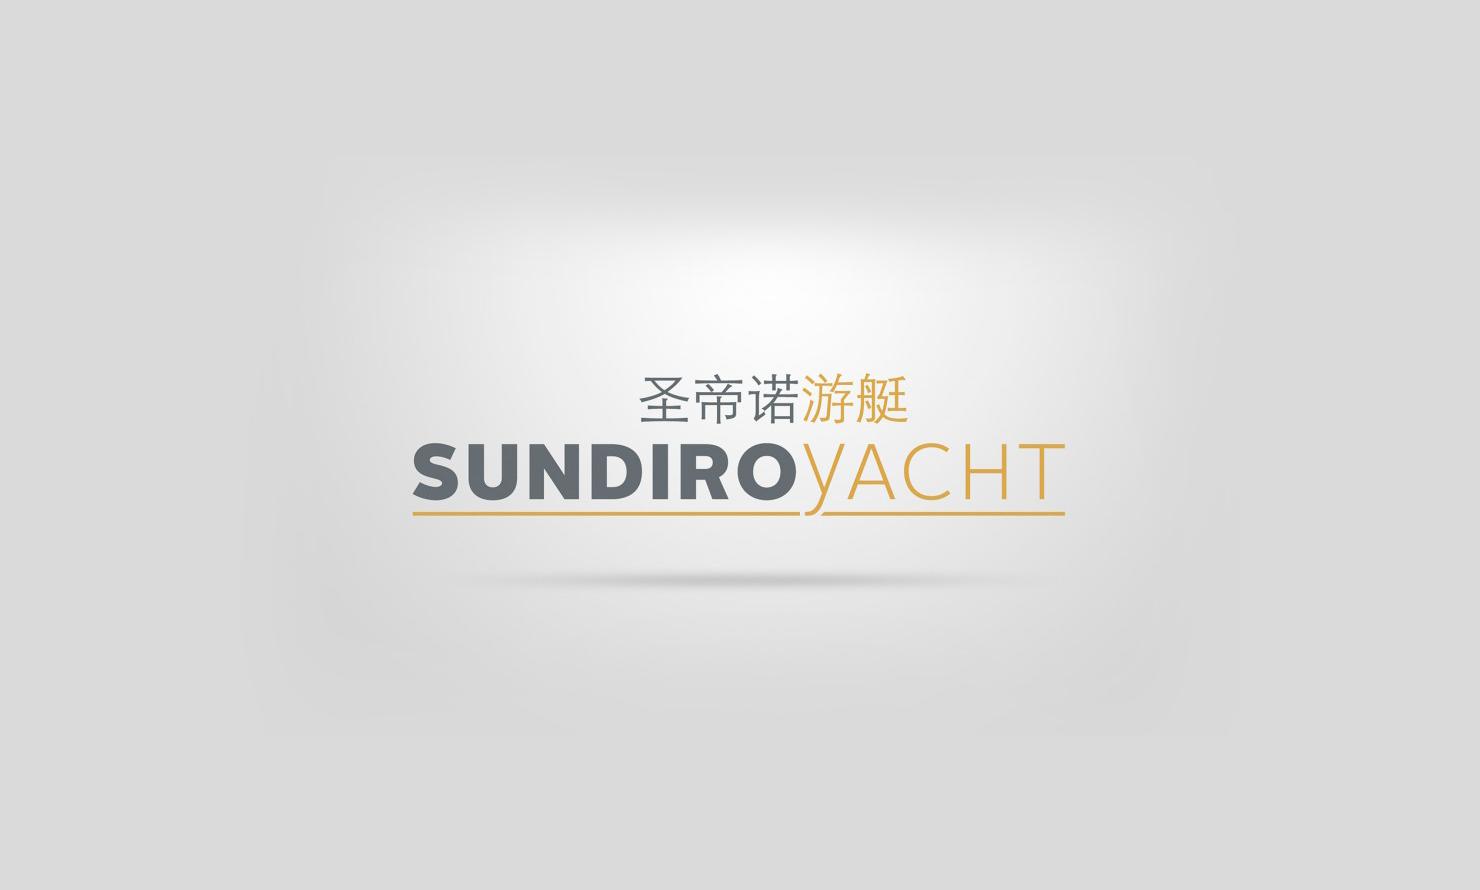 https://www.kubelibre.com/uploads/Slider-work-tutti-clienti/sundiro-yacht-l-eccelenza-italiana-sbarca-in-cina-6.jpg